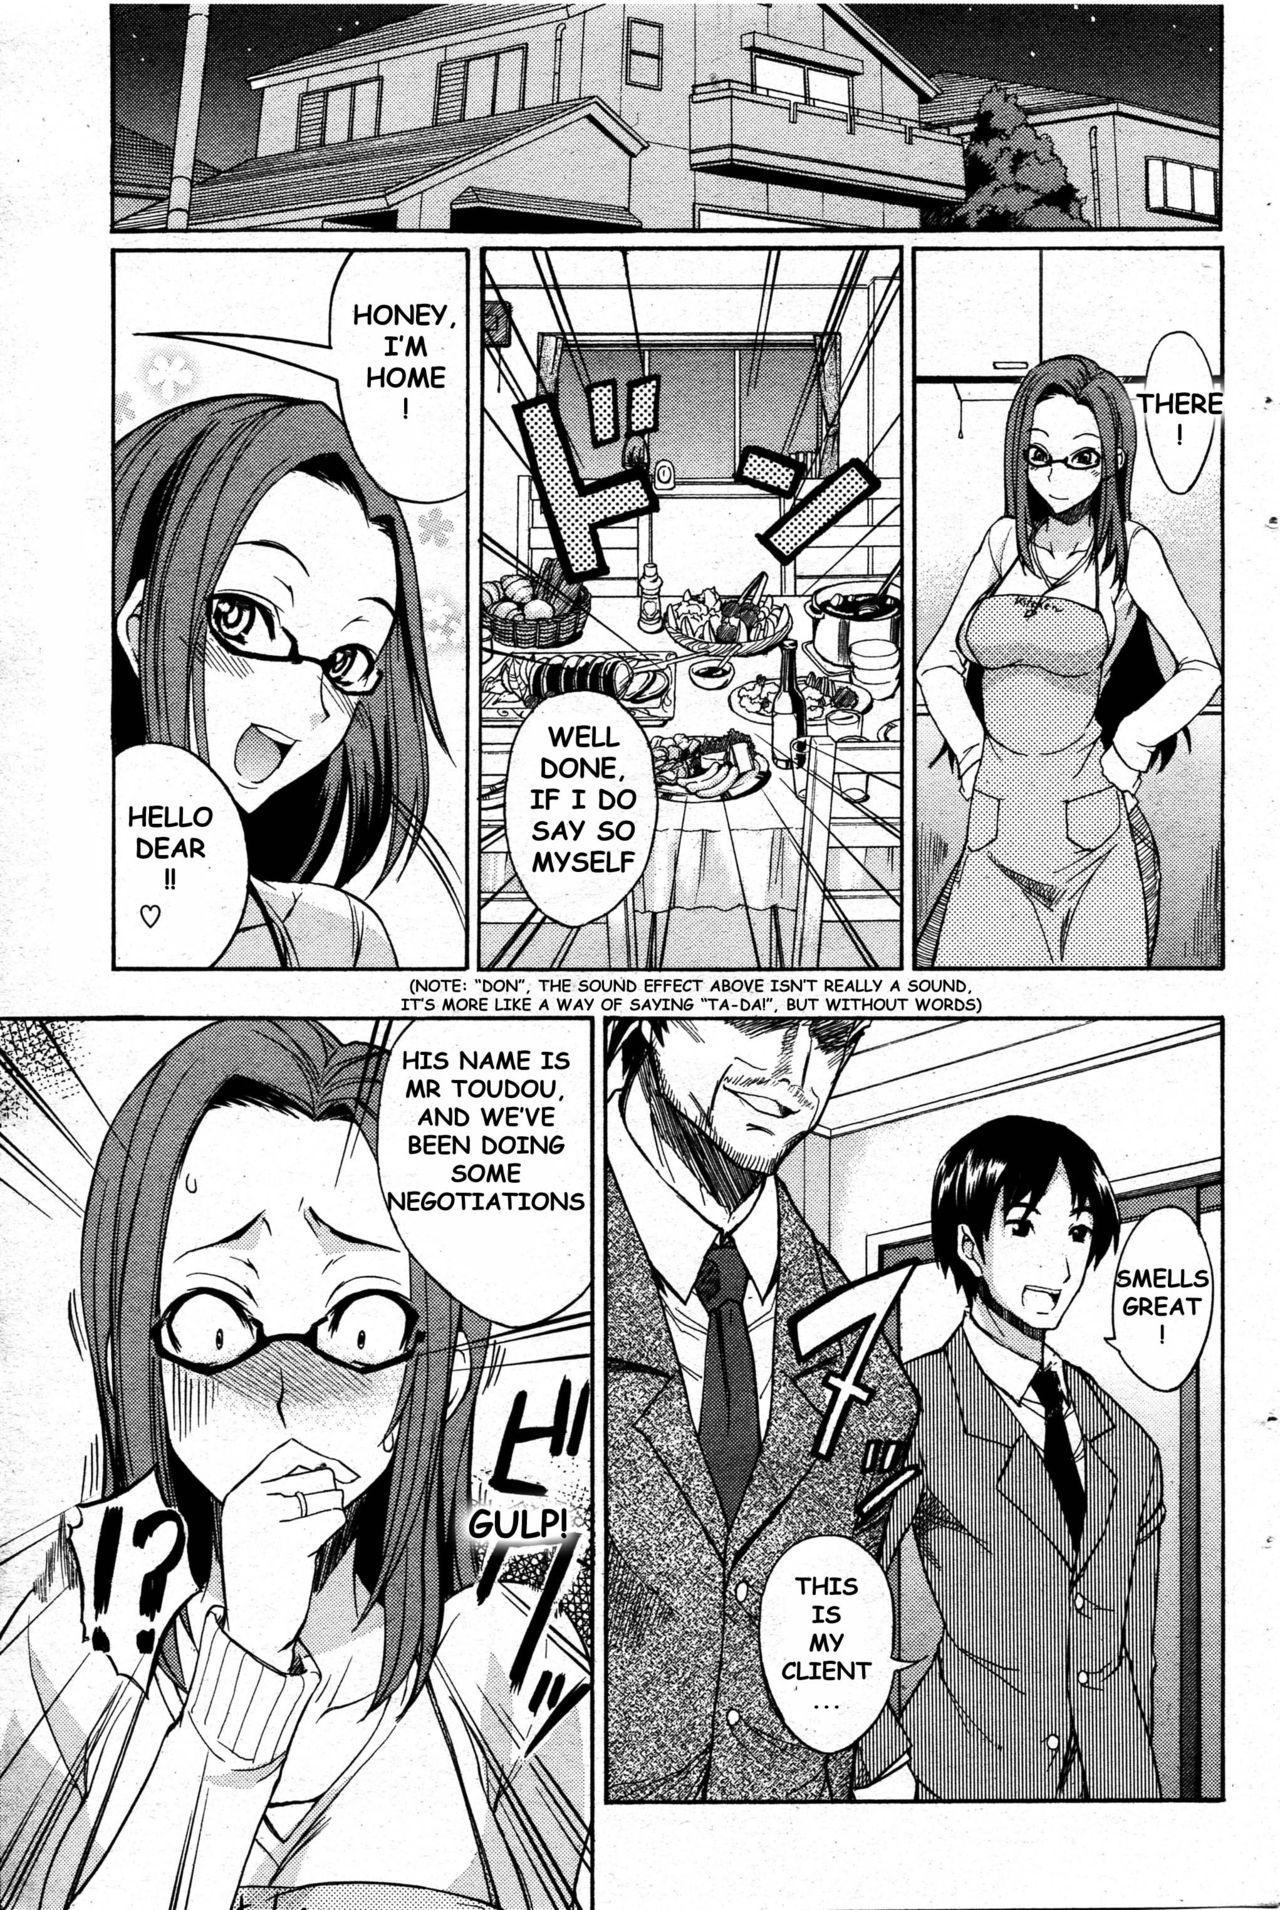 Okusan no Himitsu | A Wife's Secret 2